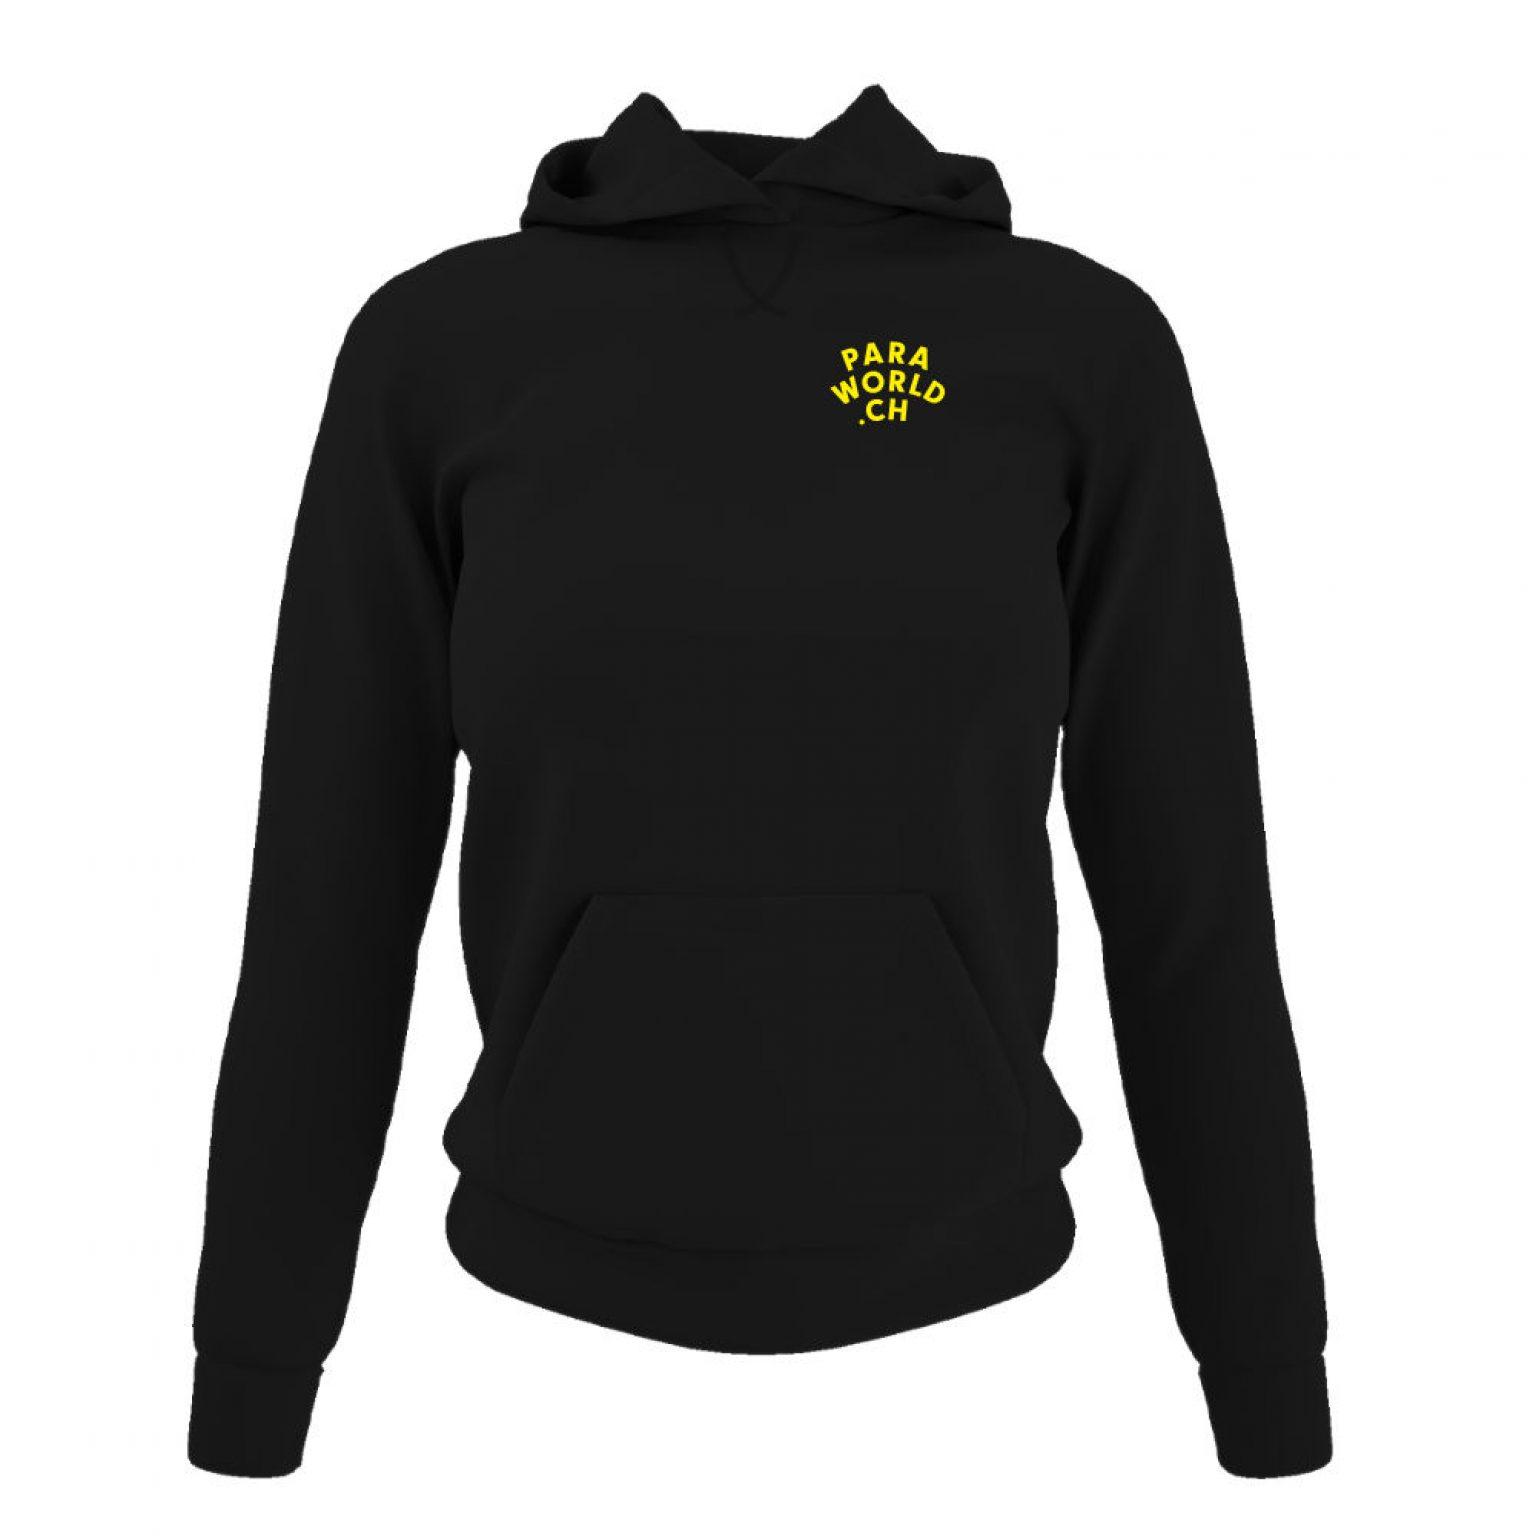 JTA b hoodie damen black front